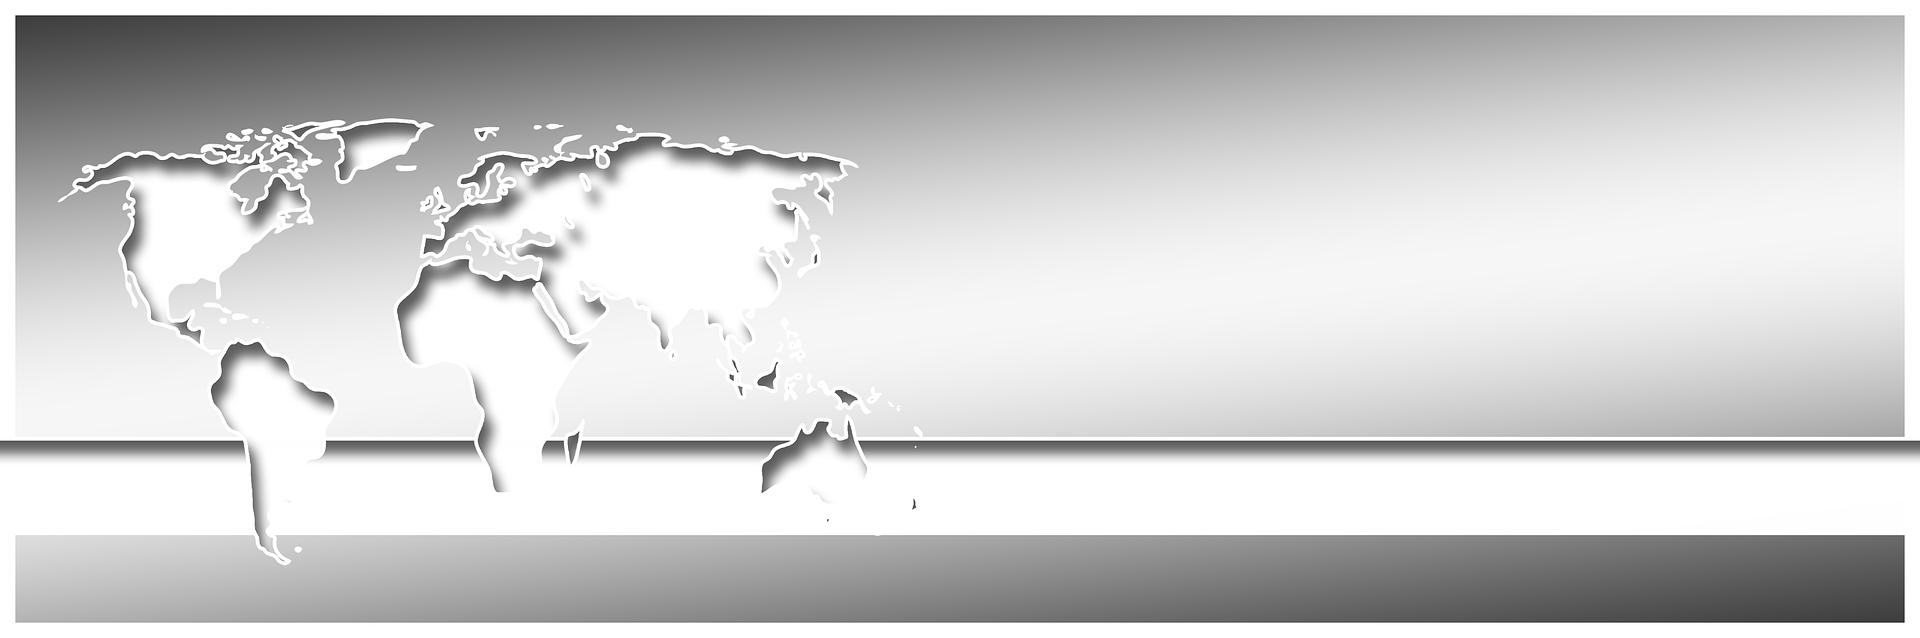 logo-1342689_1920